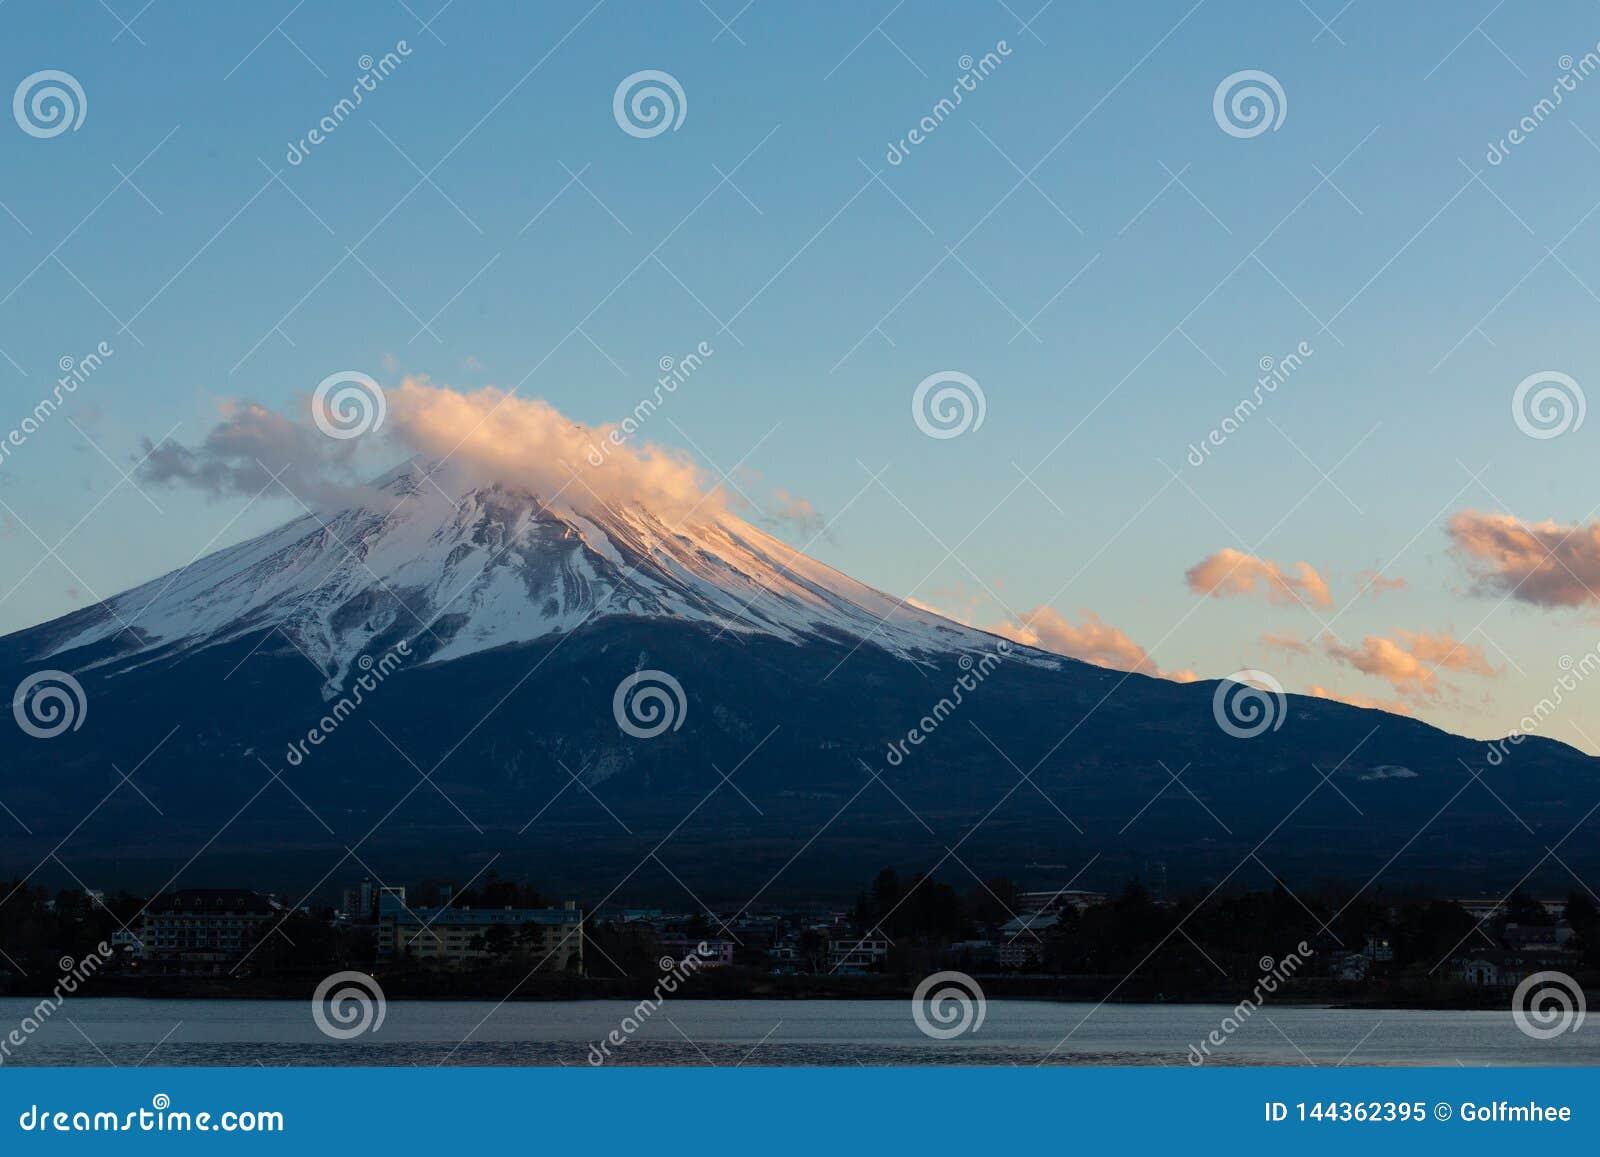 Amazing Mt Fuji Kawaguchiko lake, Japan landscape in sunset day time in blue sky background concept for fujisan japanese nature